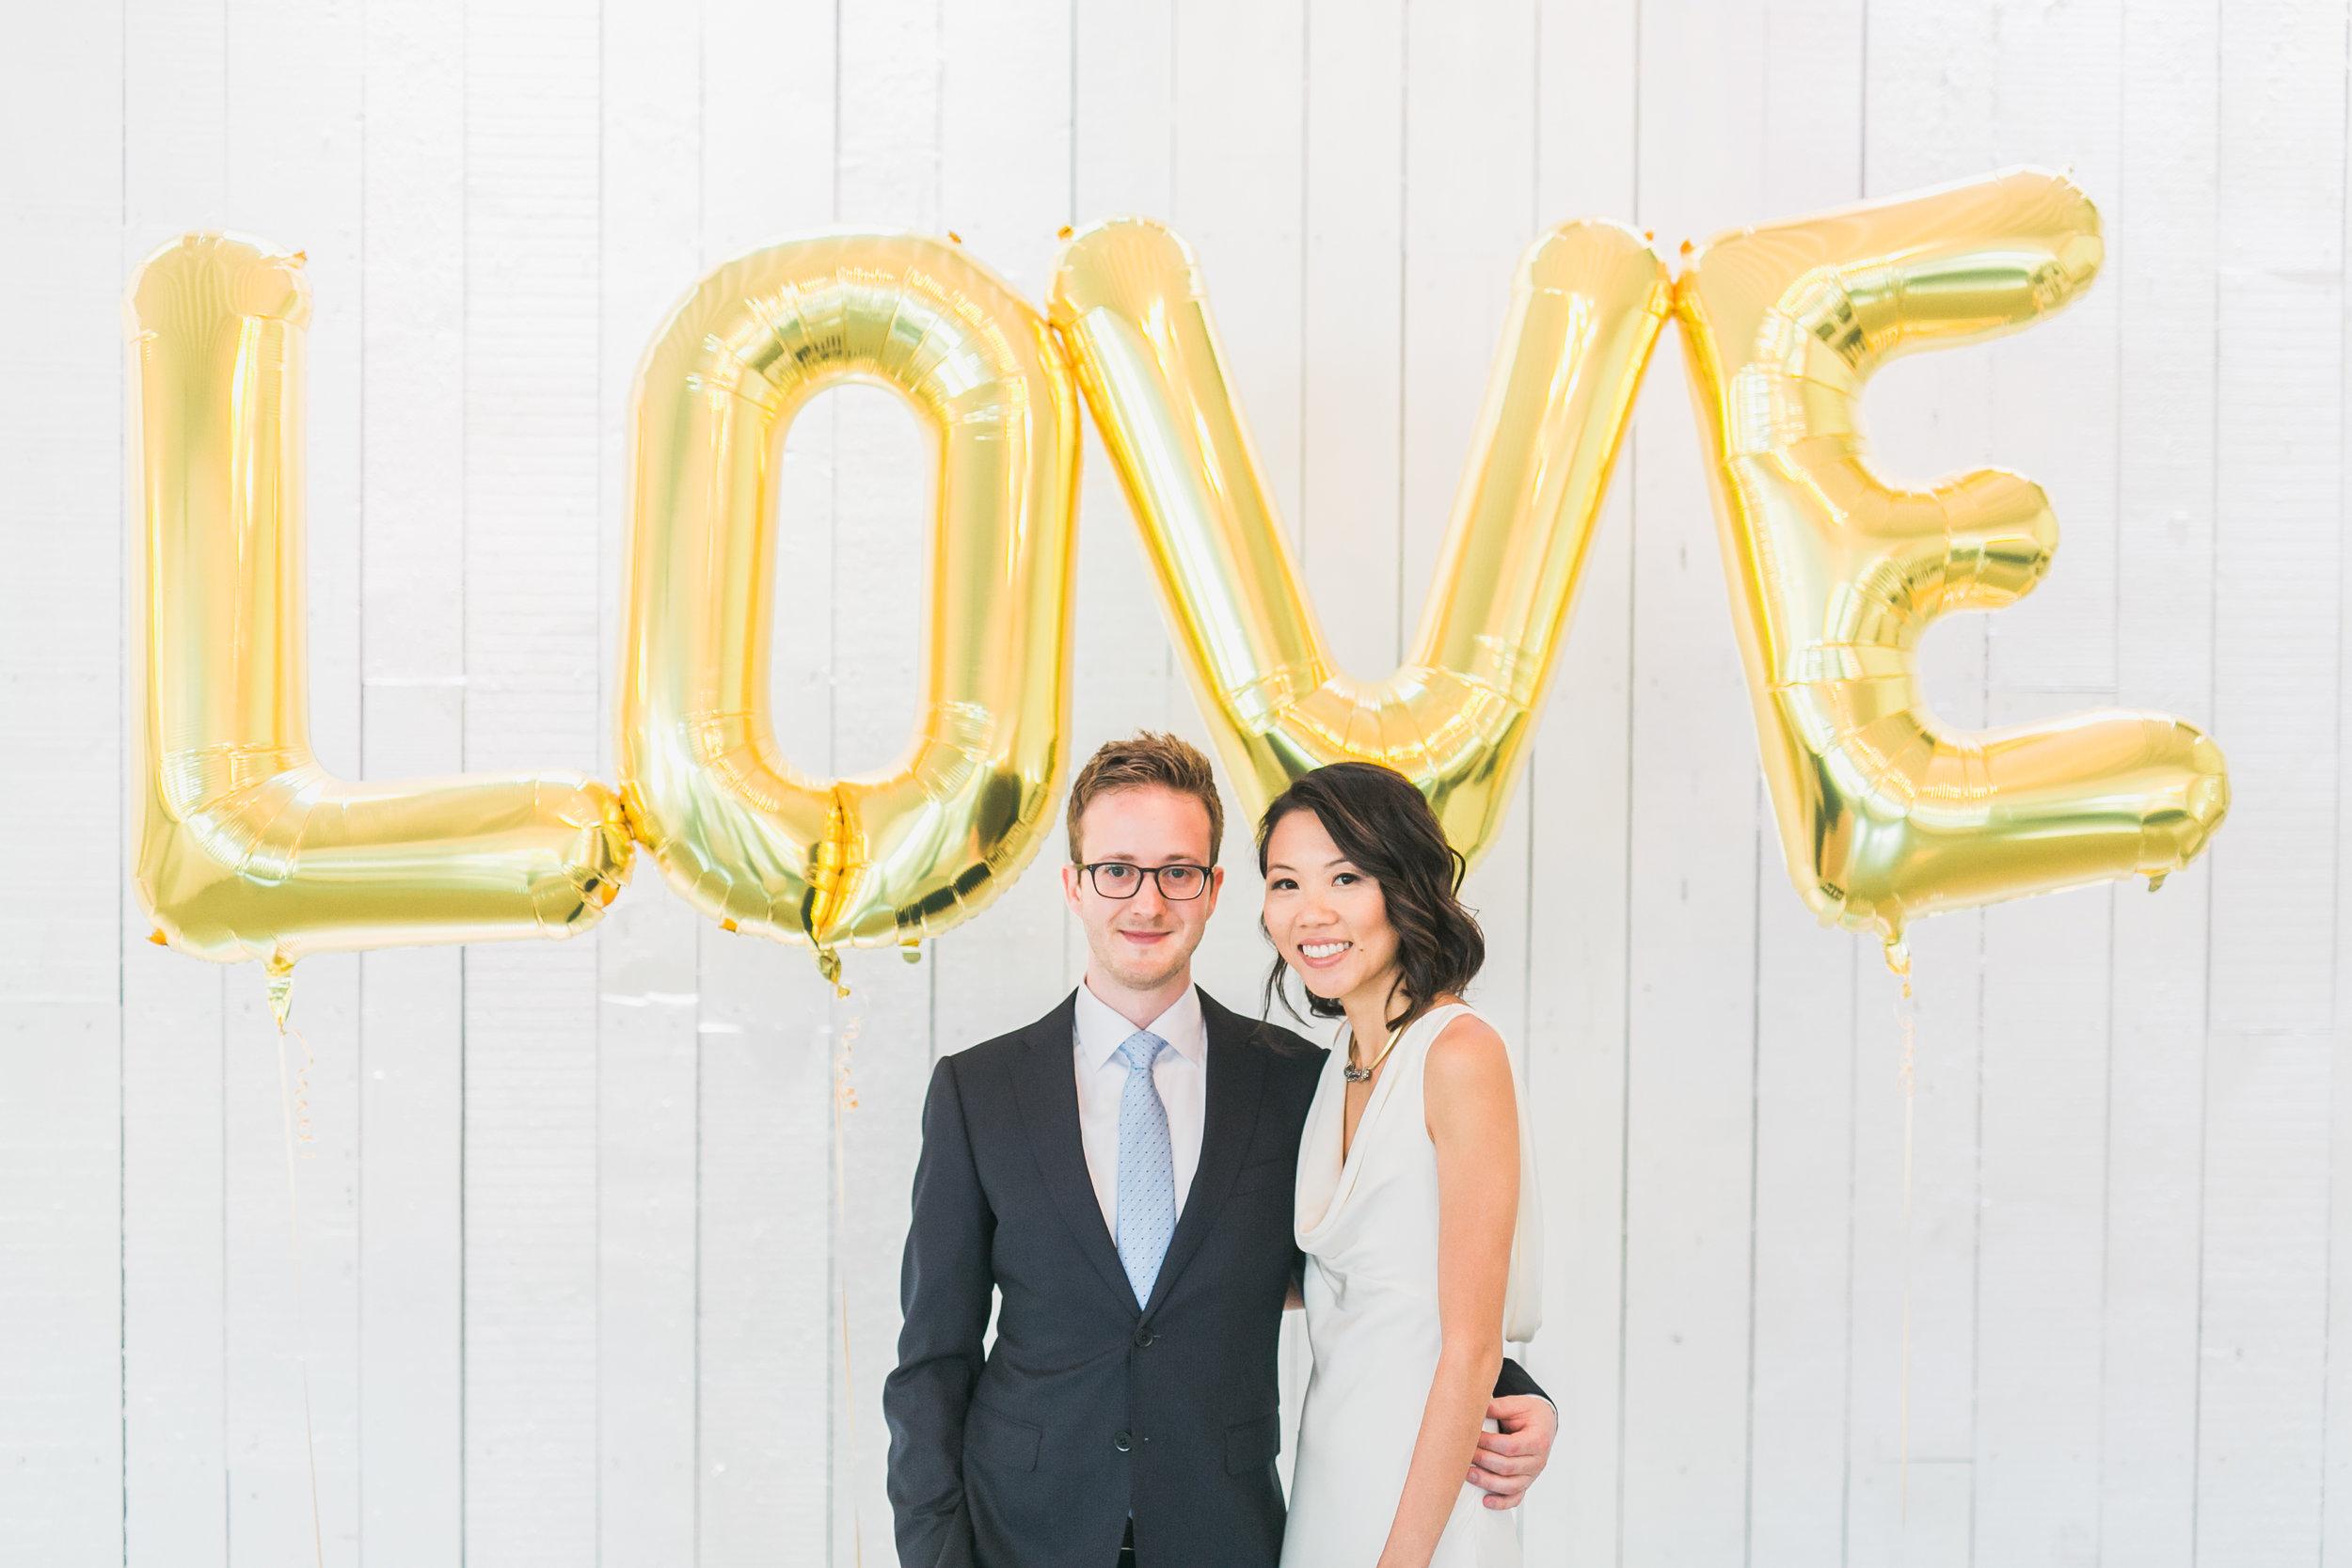 KD-Berkeley_Field_House_Wedding_Photos-Rhythm_Photography-007